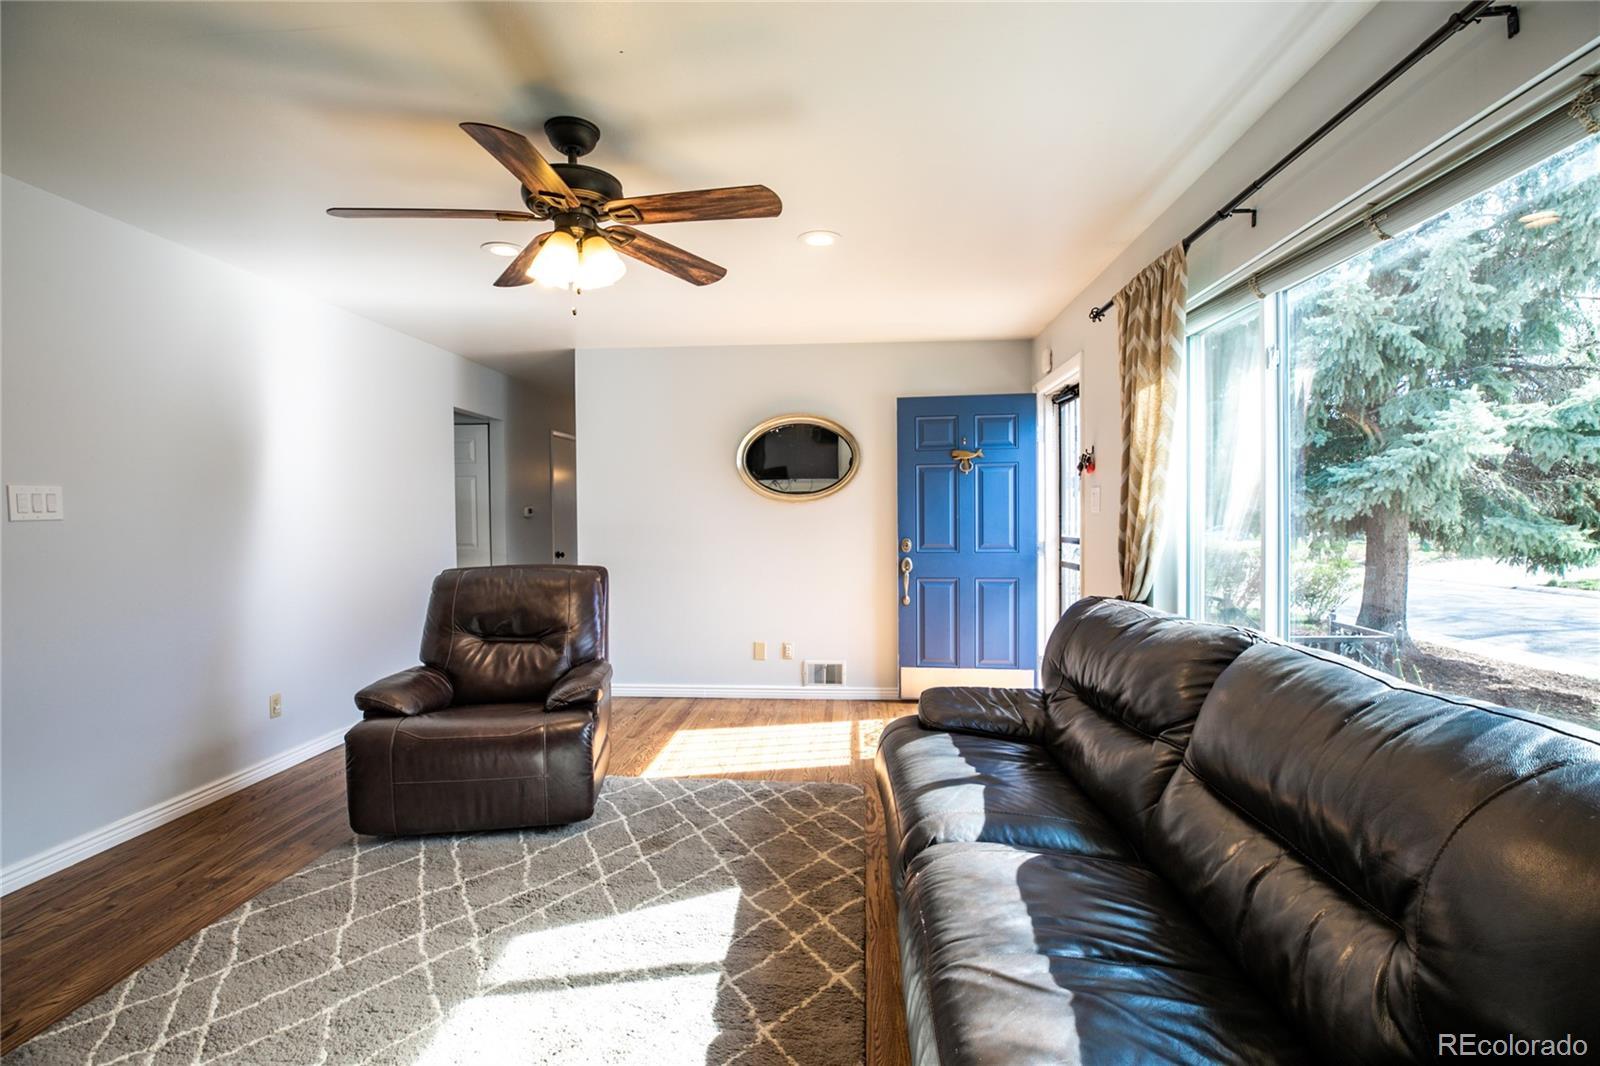 MLS# 2588563 - 6 - 6728 Newman Street, Arvada, CO 80004